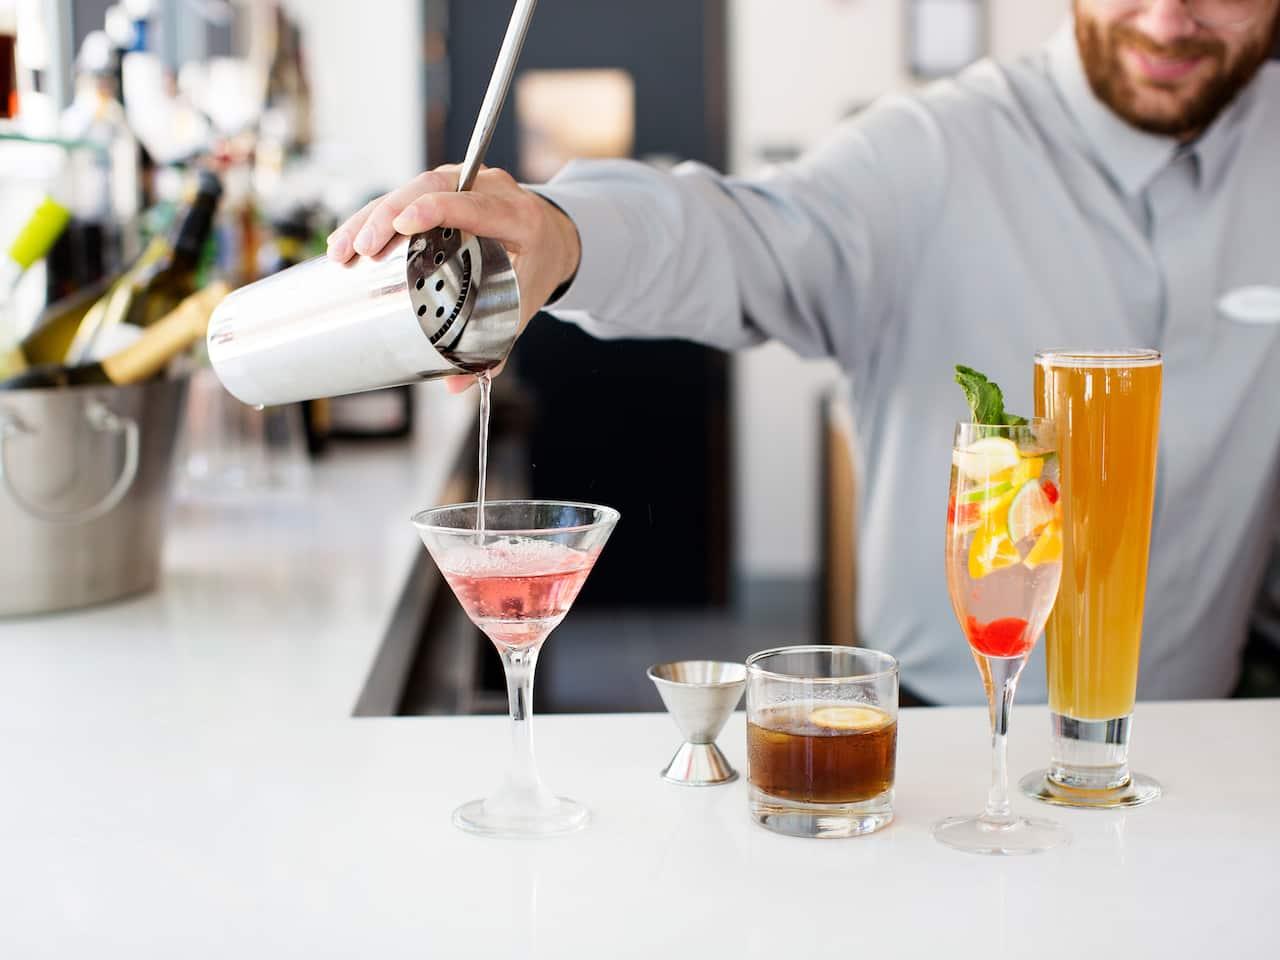 Bartender Pouring